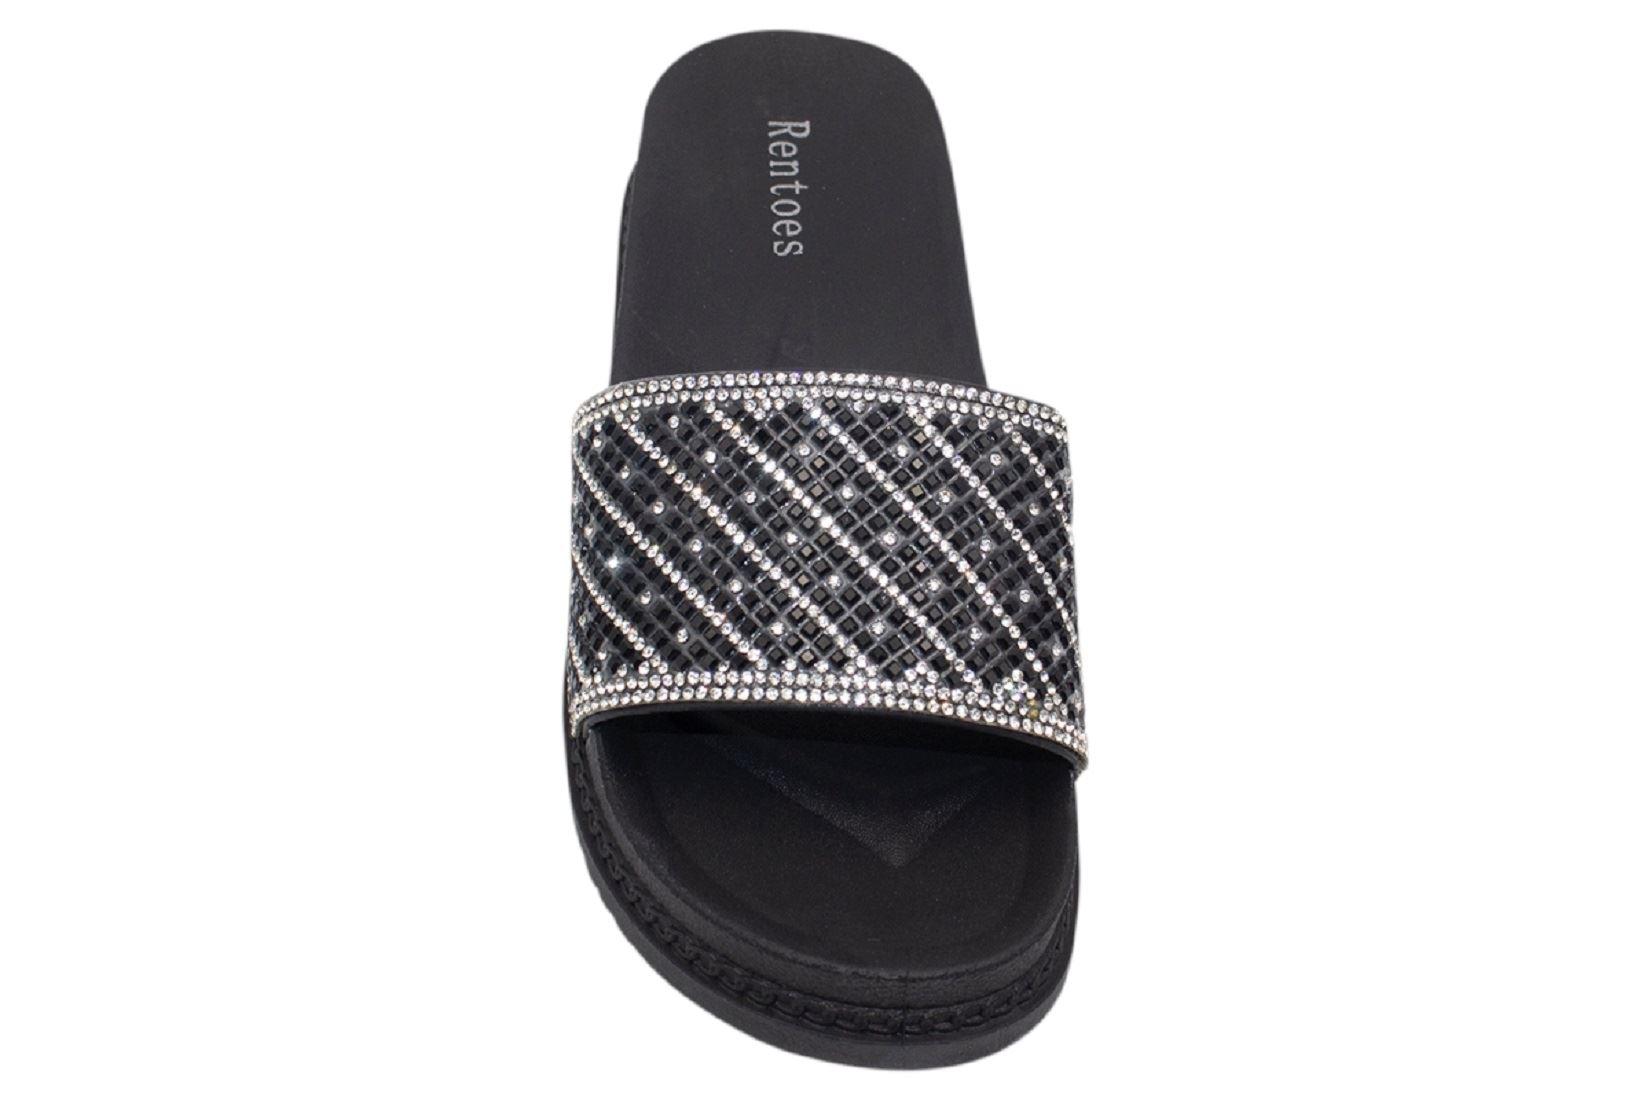 Womens-Sliders-Casual-Slippers-Mules-Ladies-Diamante-Flip-Flop-Sandals-Shoes thumbnail 58